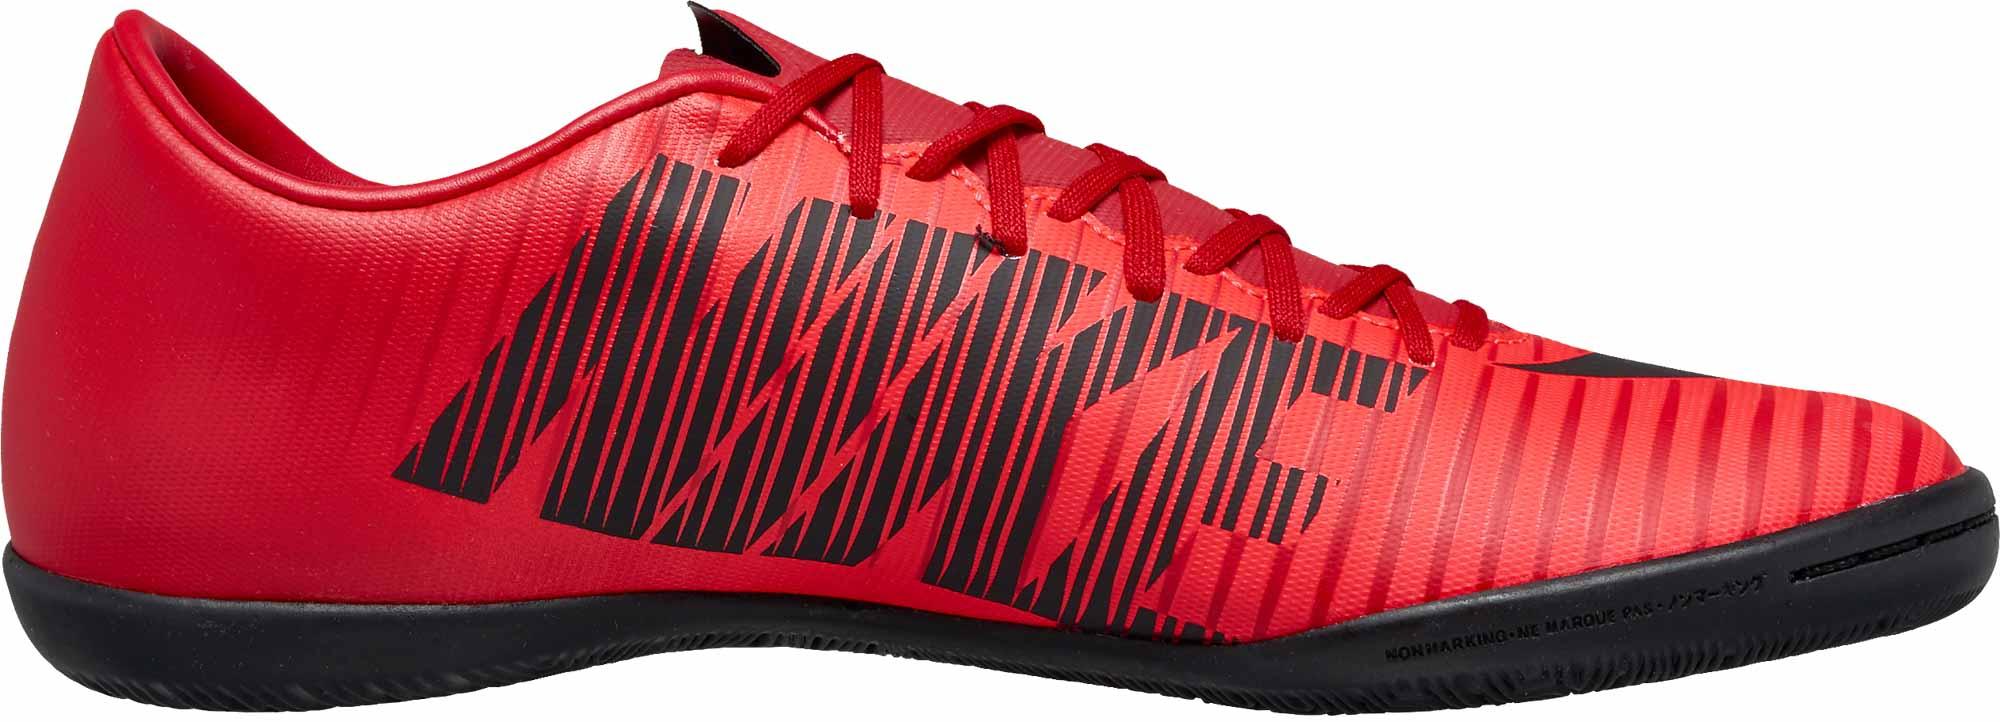 05571889b Nike MercurialX Victory VI IC – University Red/Black